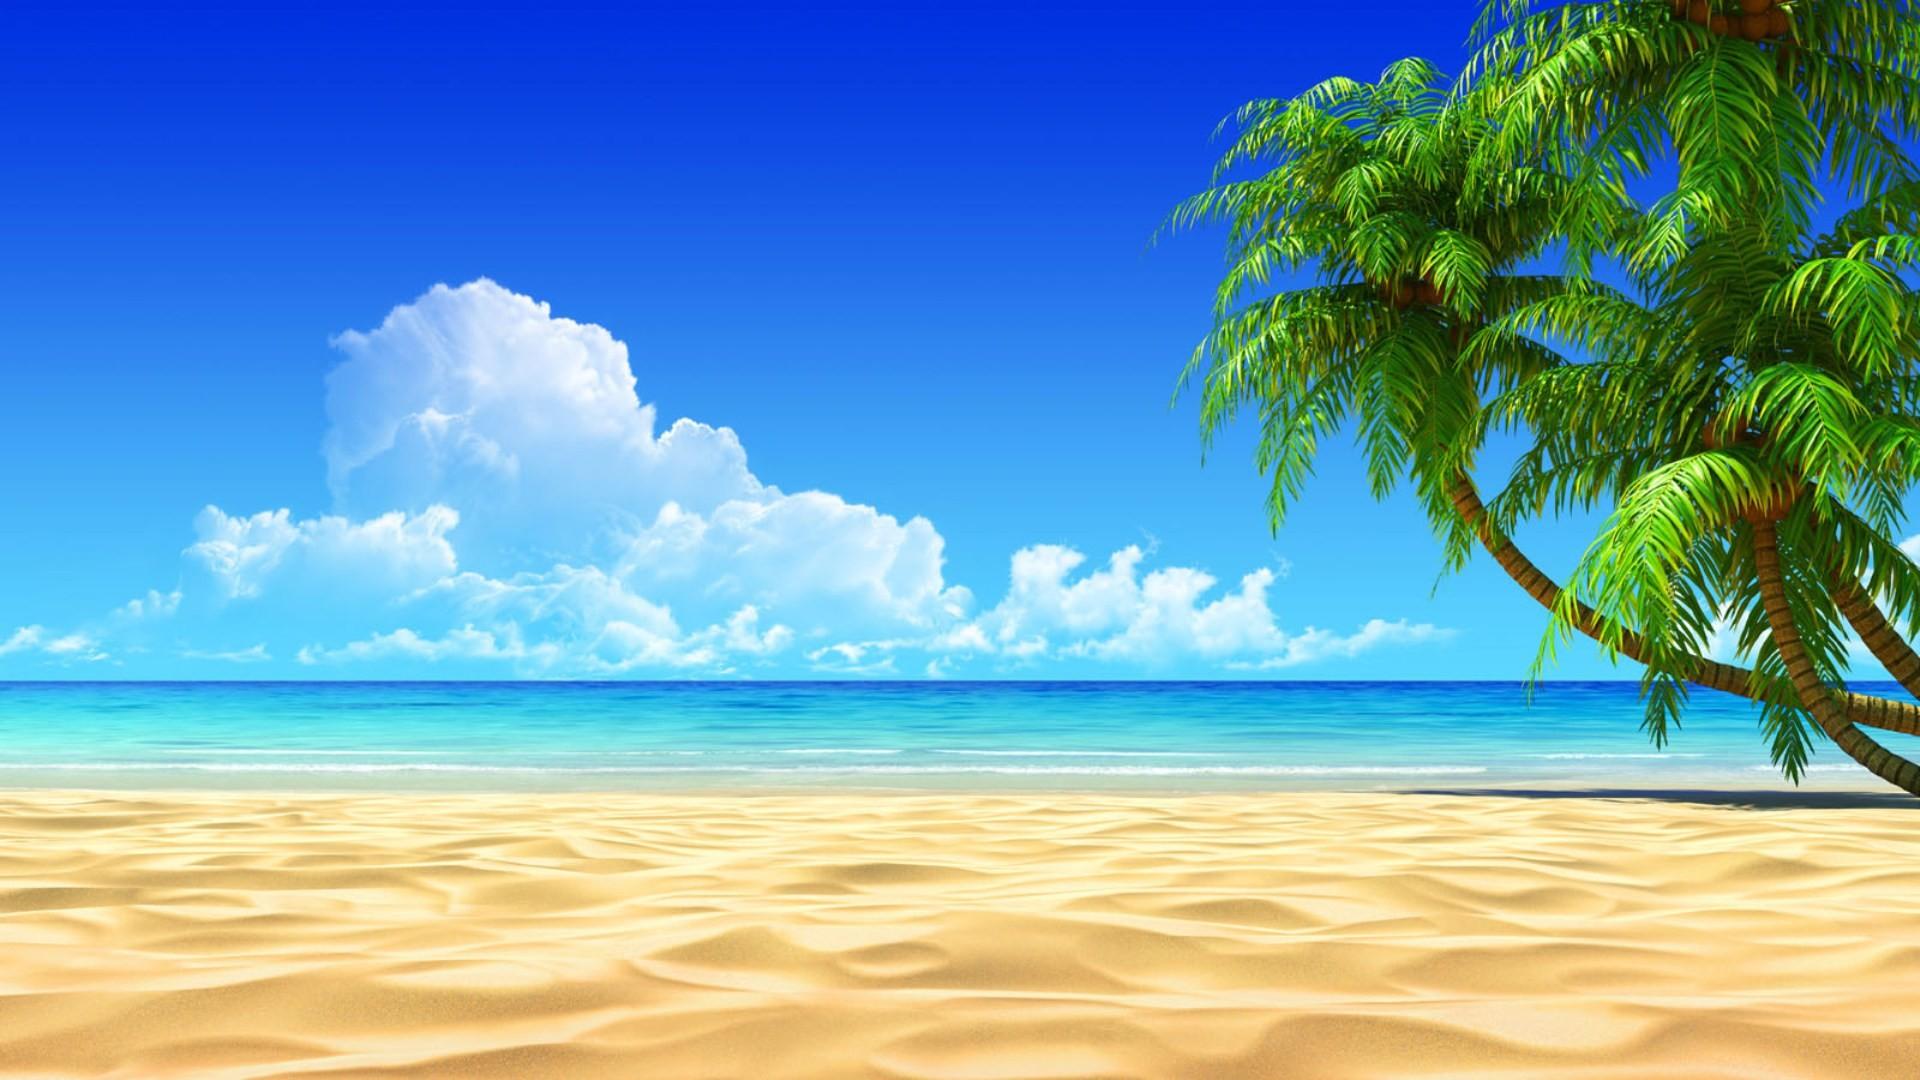 Free Beach Screensavers